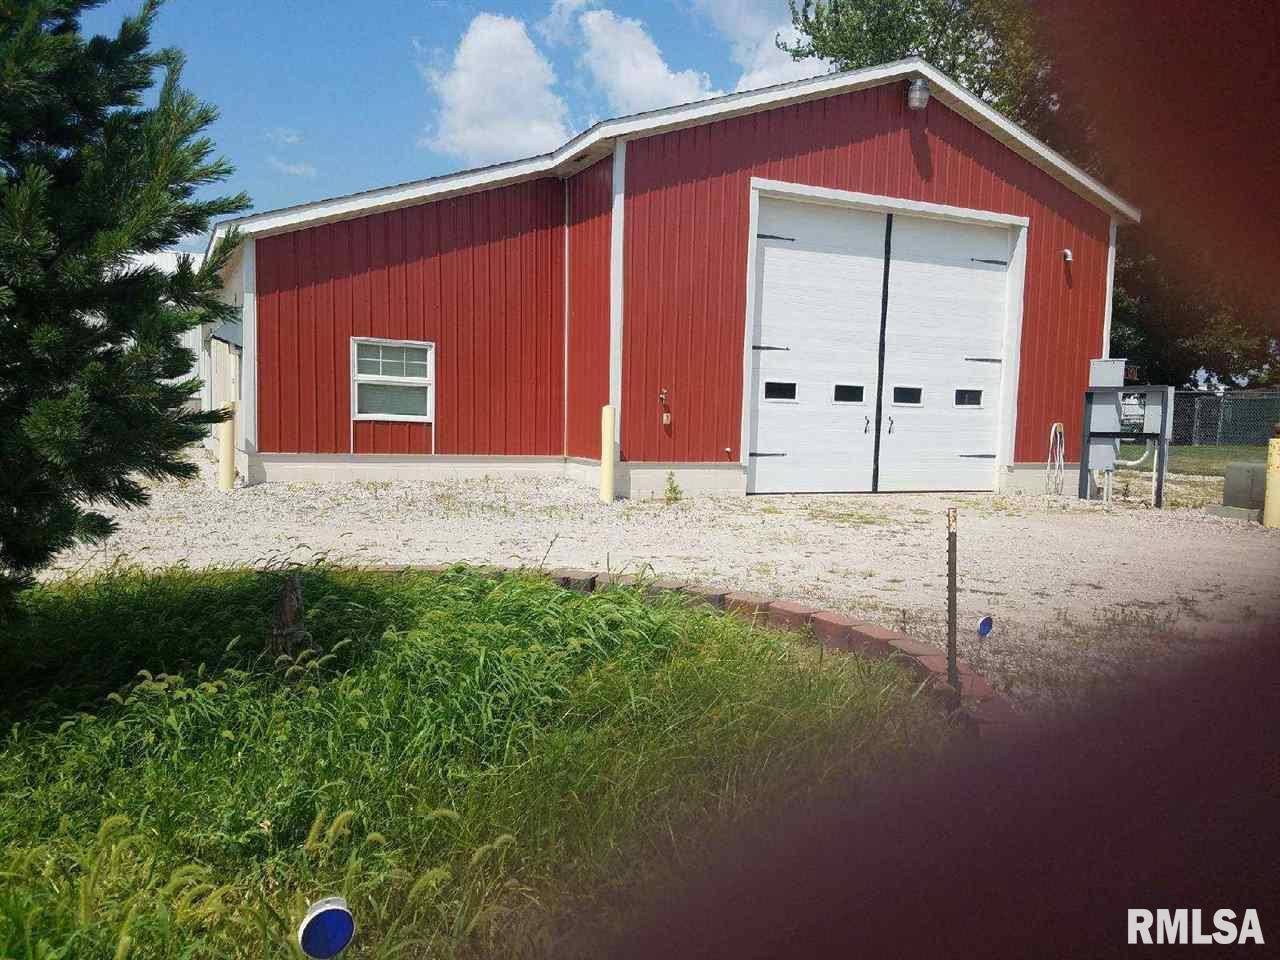 225 34TH Property Photo - Rock Island, IL real estate listing